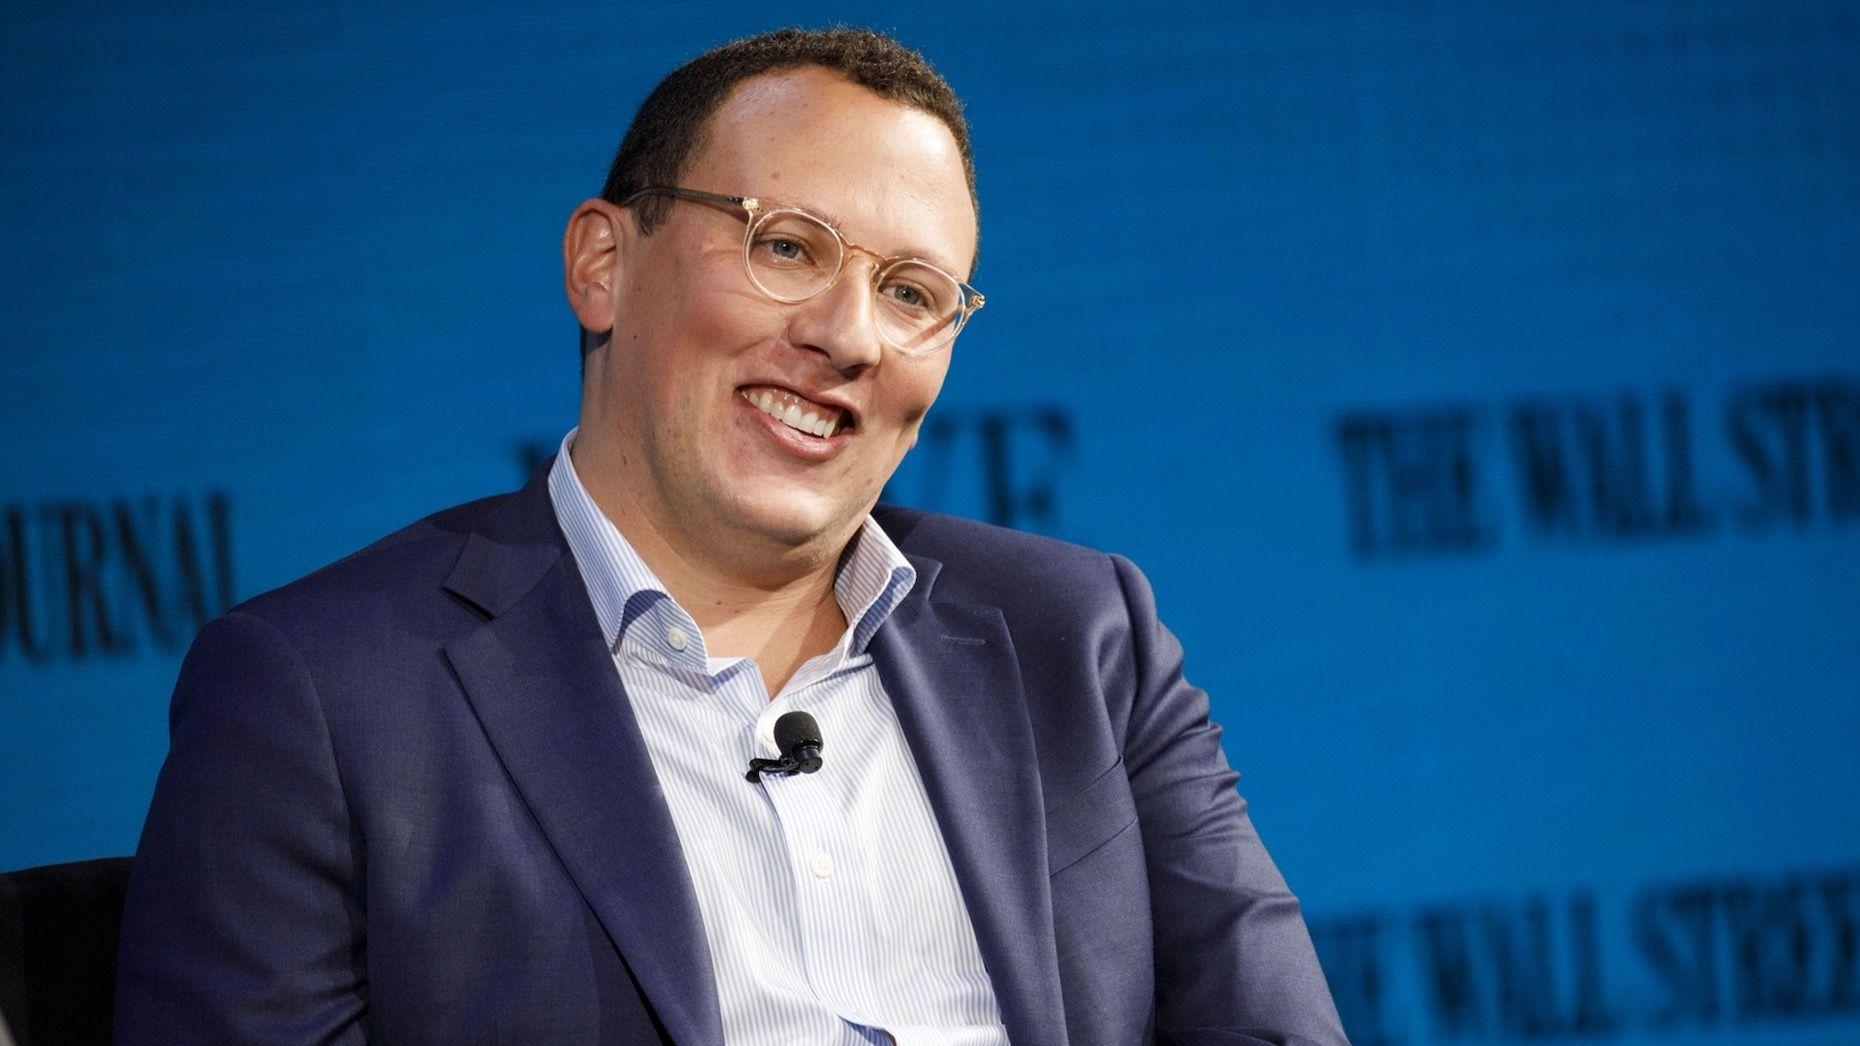 Casper CEO Philip Krim. Photo by Bloomberg.